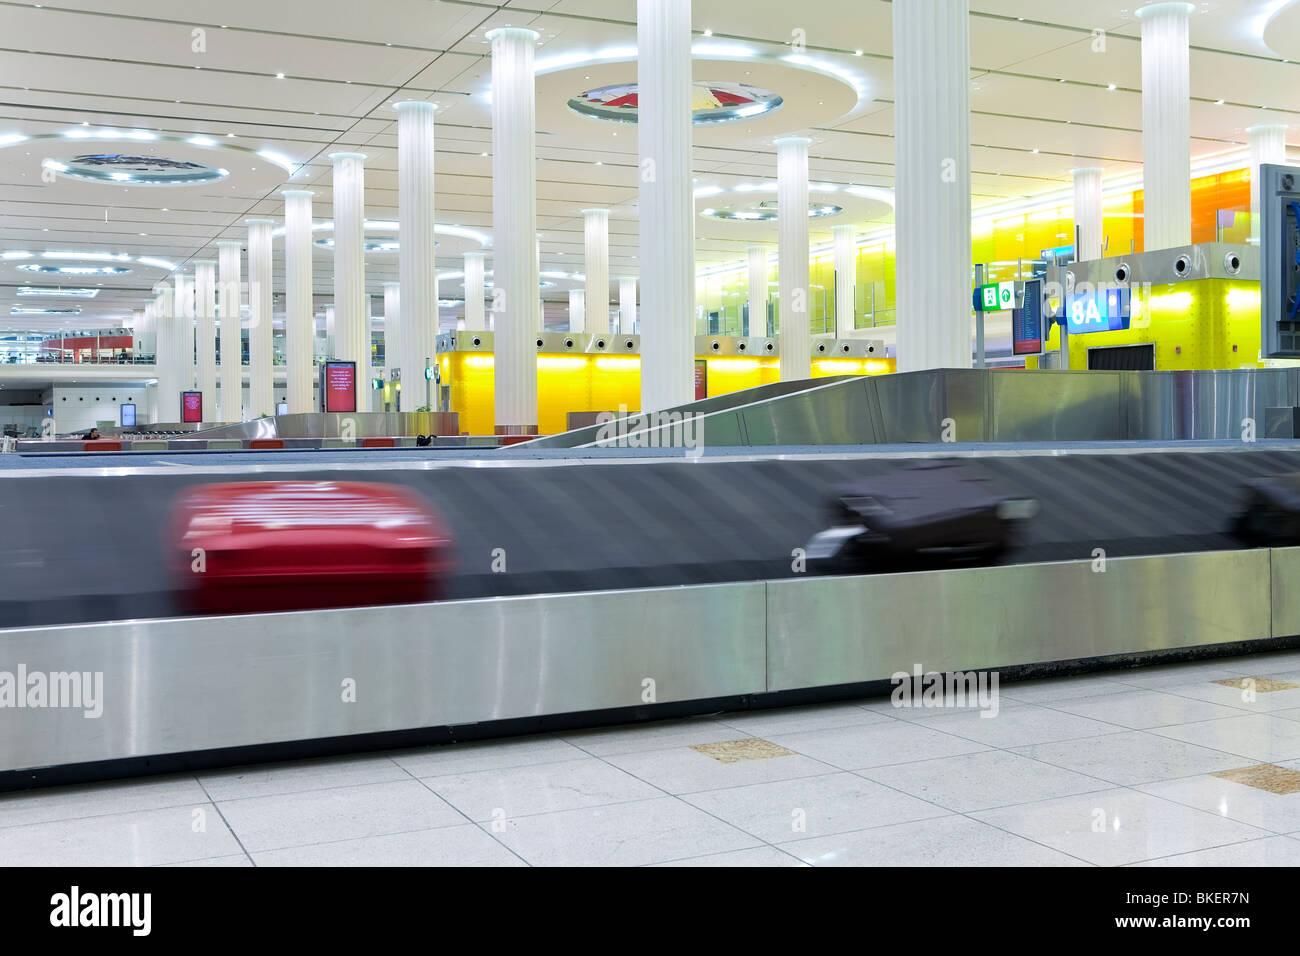 UAE, United Arab Emirates, Dubai, Dubai International Airport, Terminal 3, Baggage Carousel in the Arrivals Hall - Stock Image